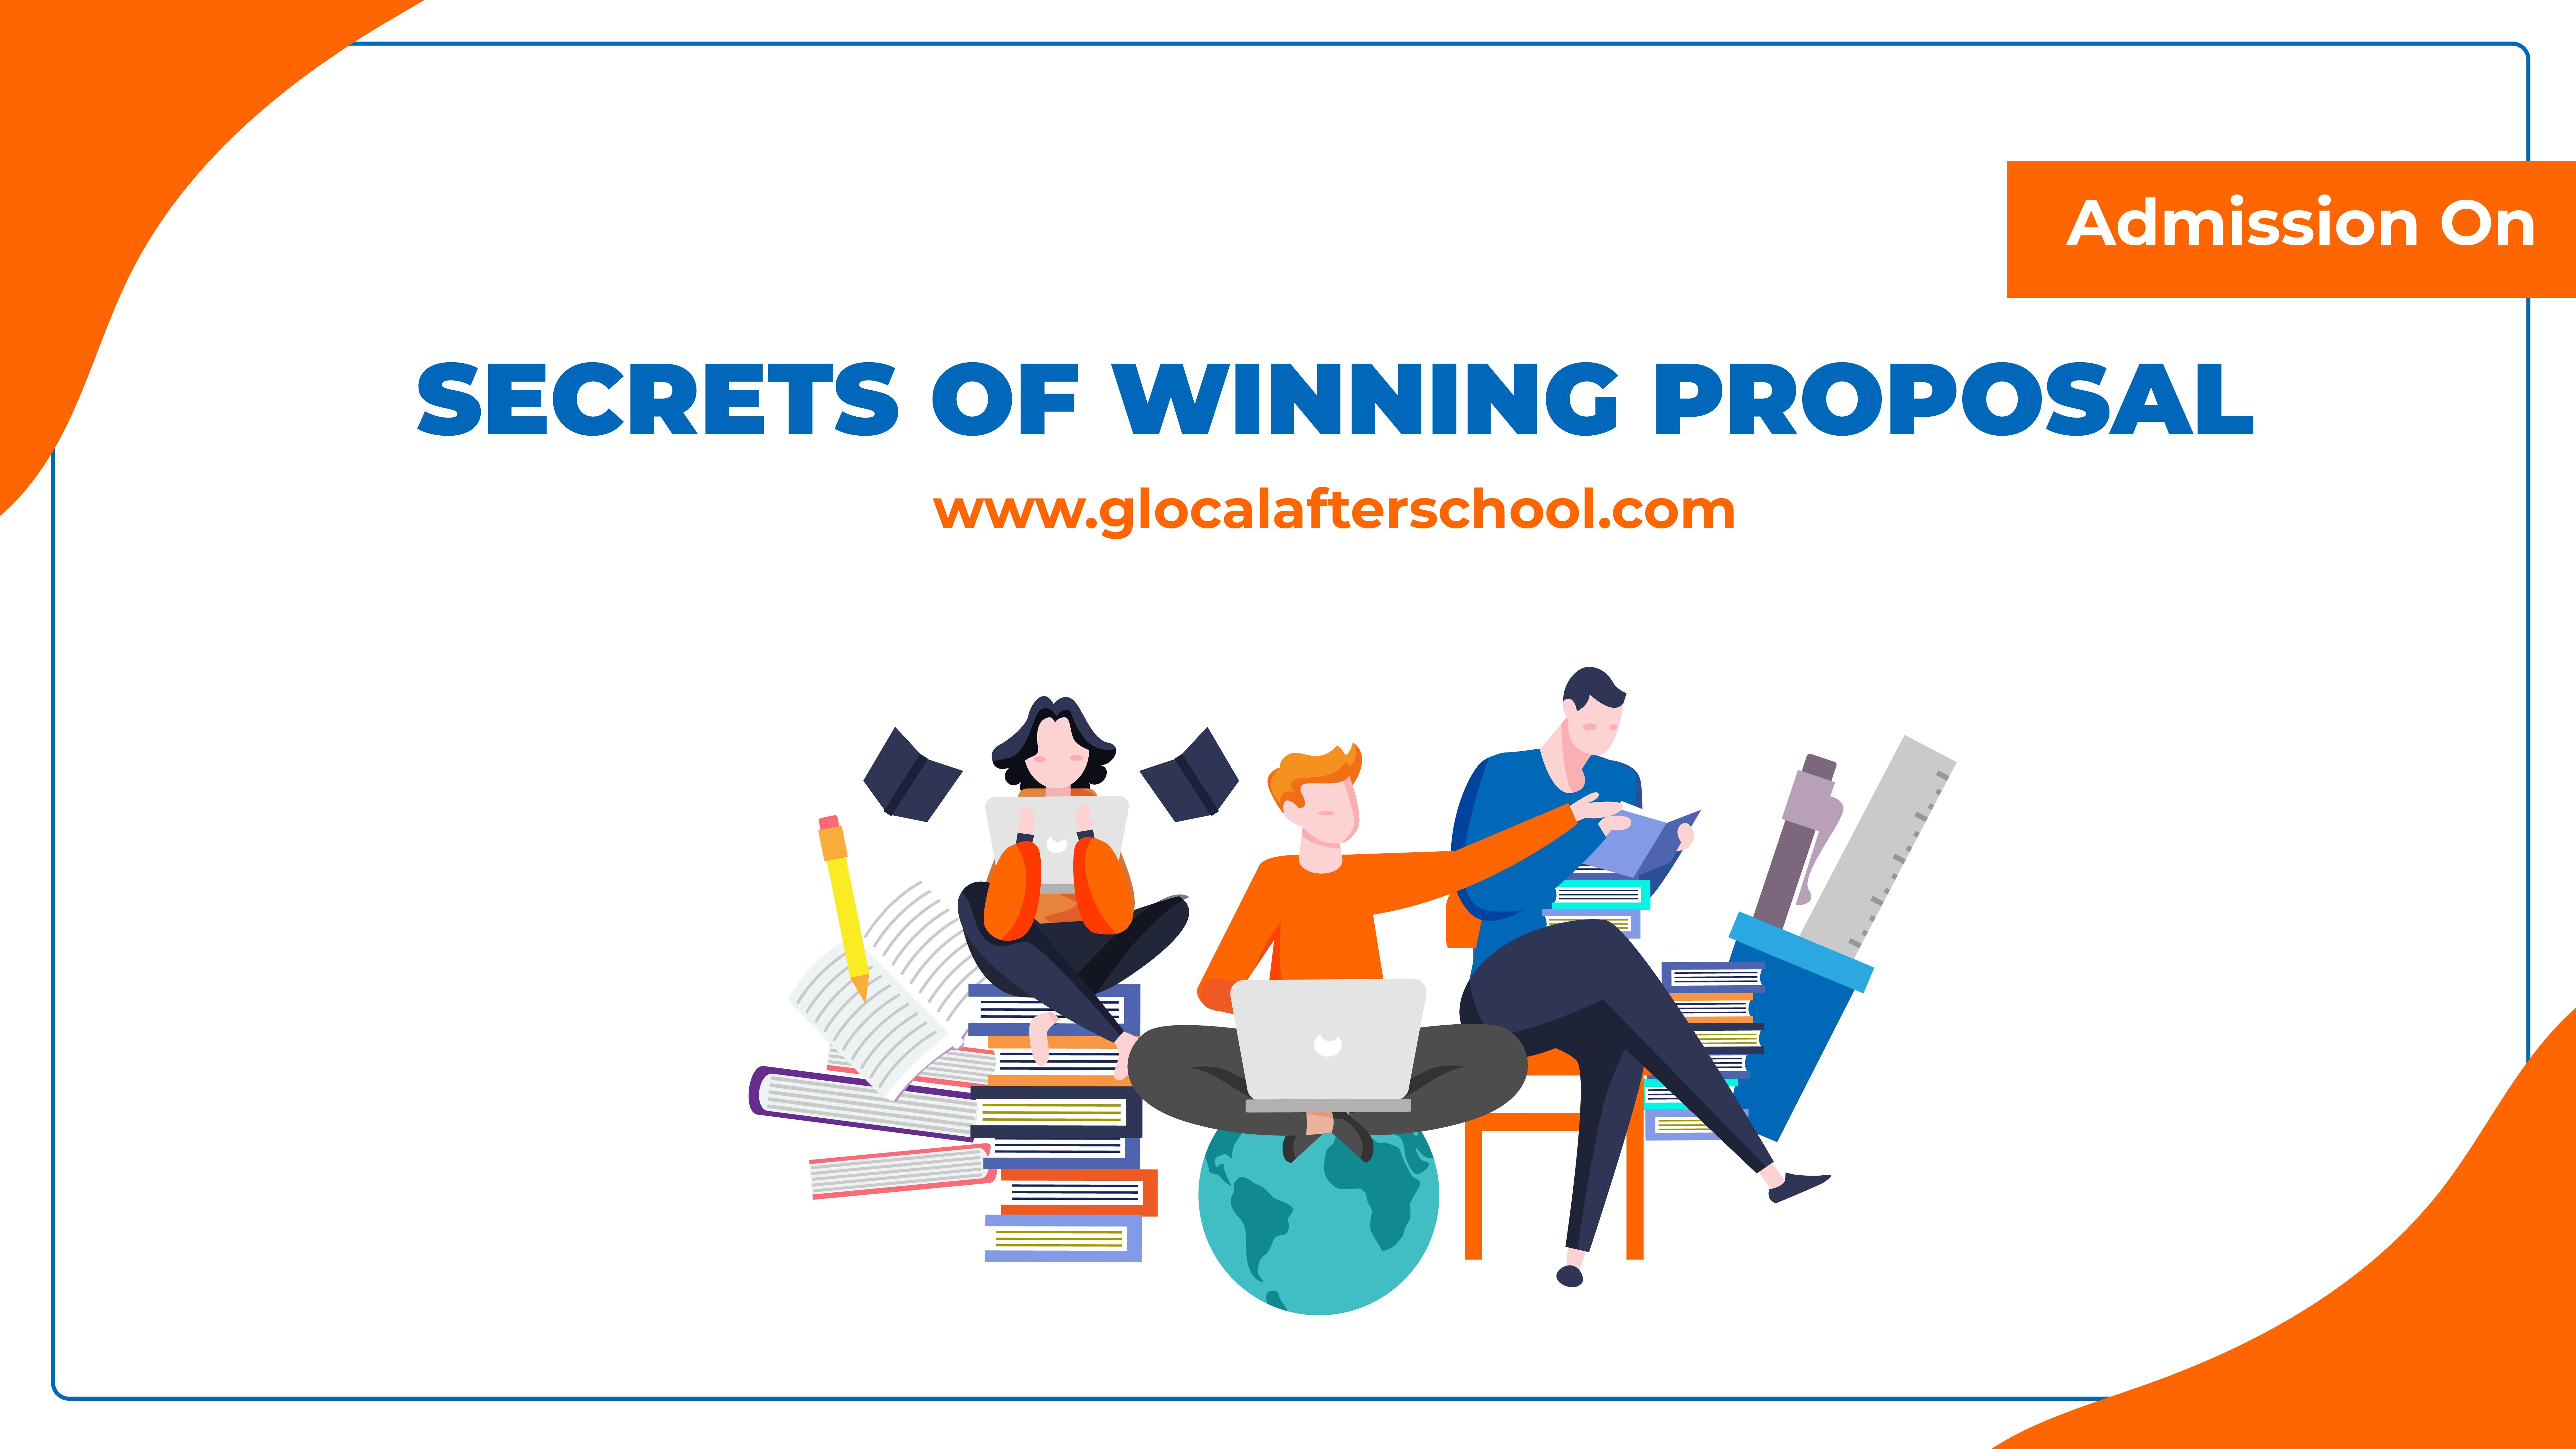 Secrets of Winning Proposal